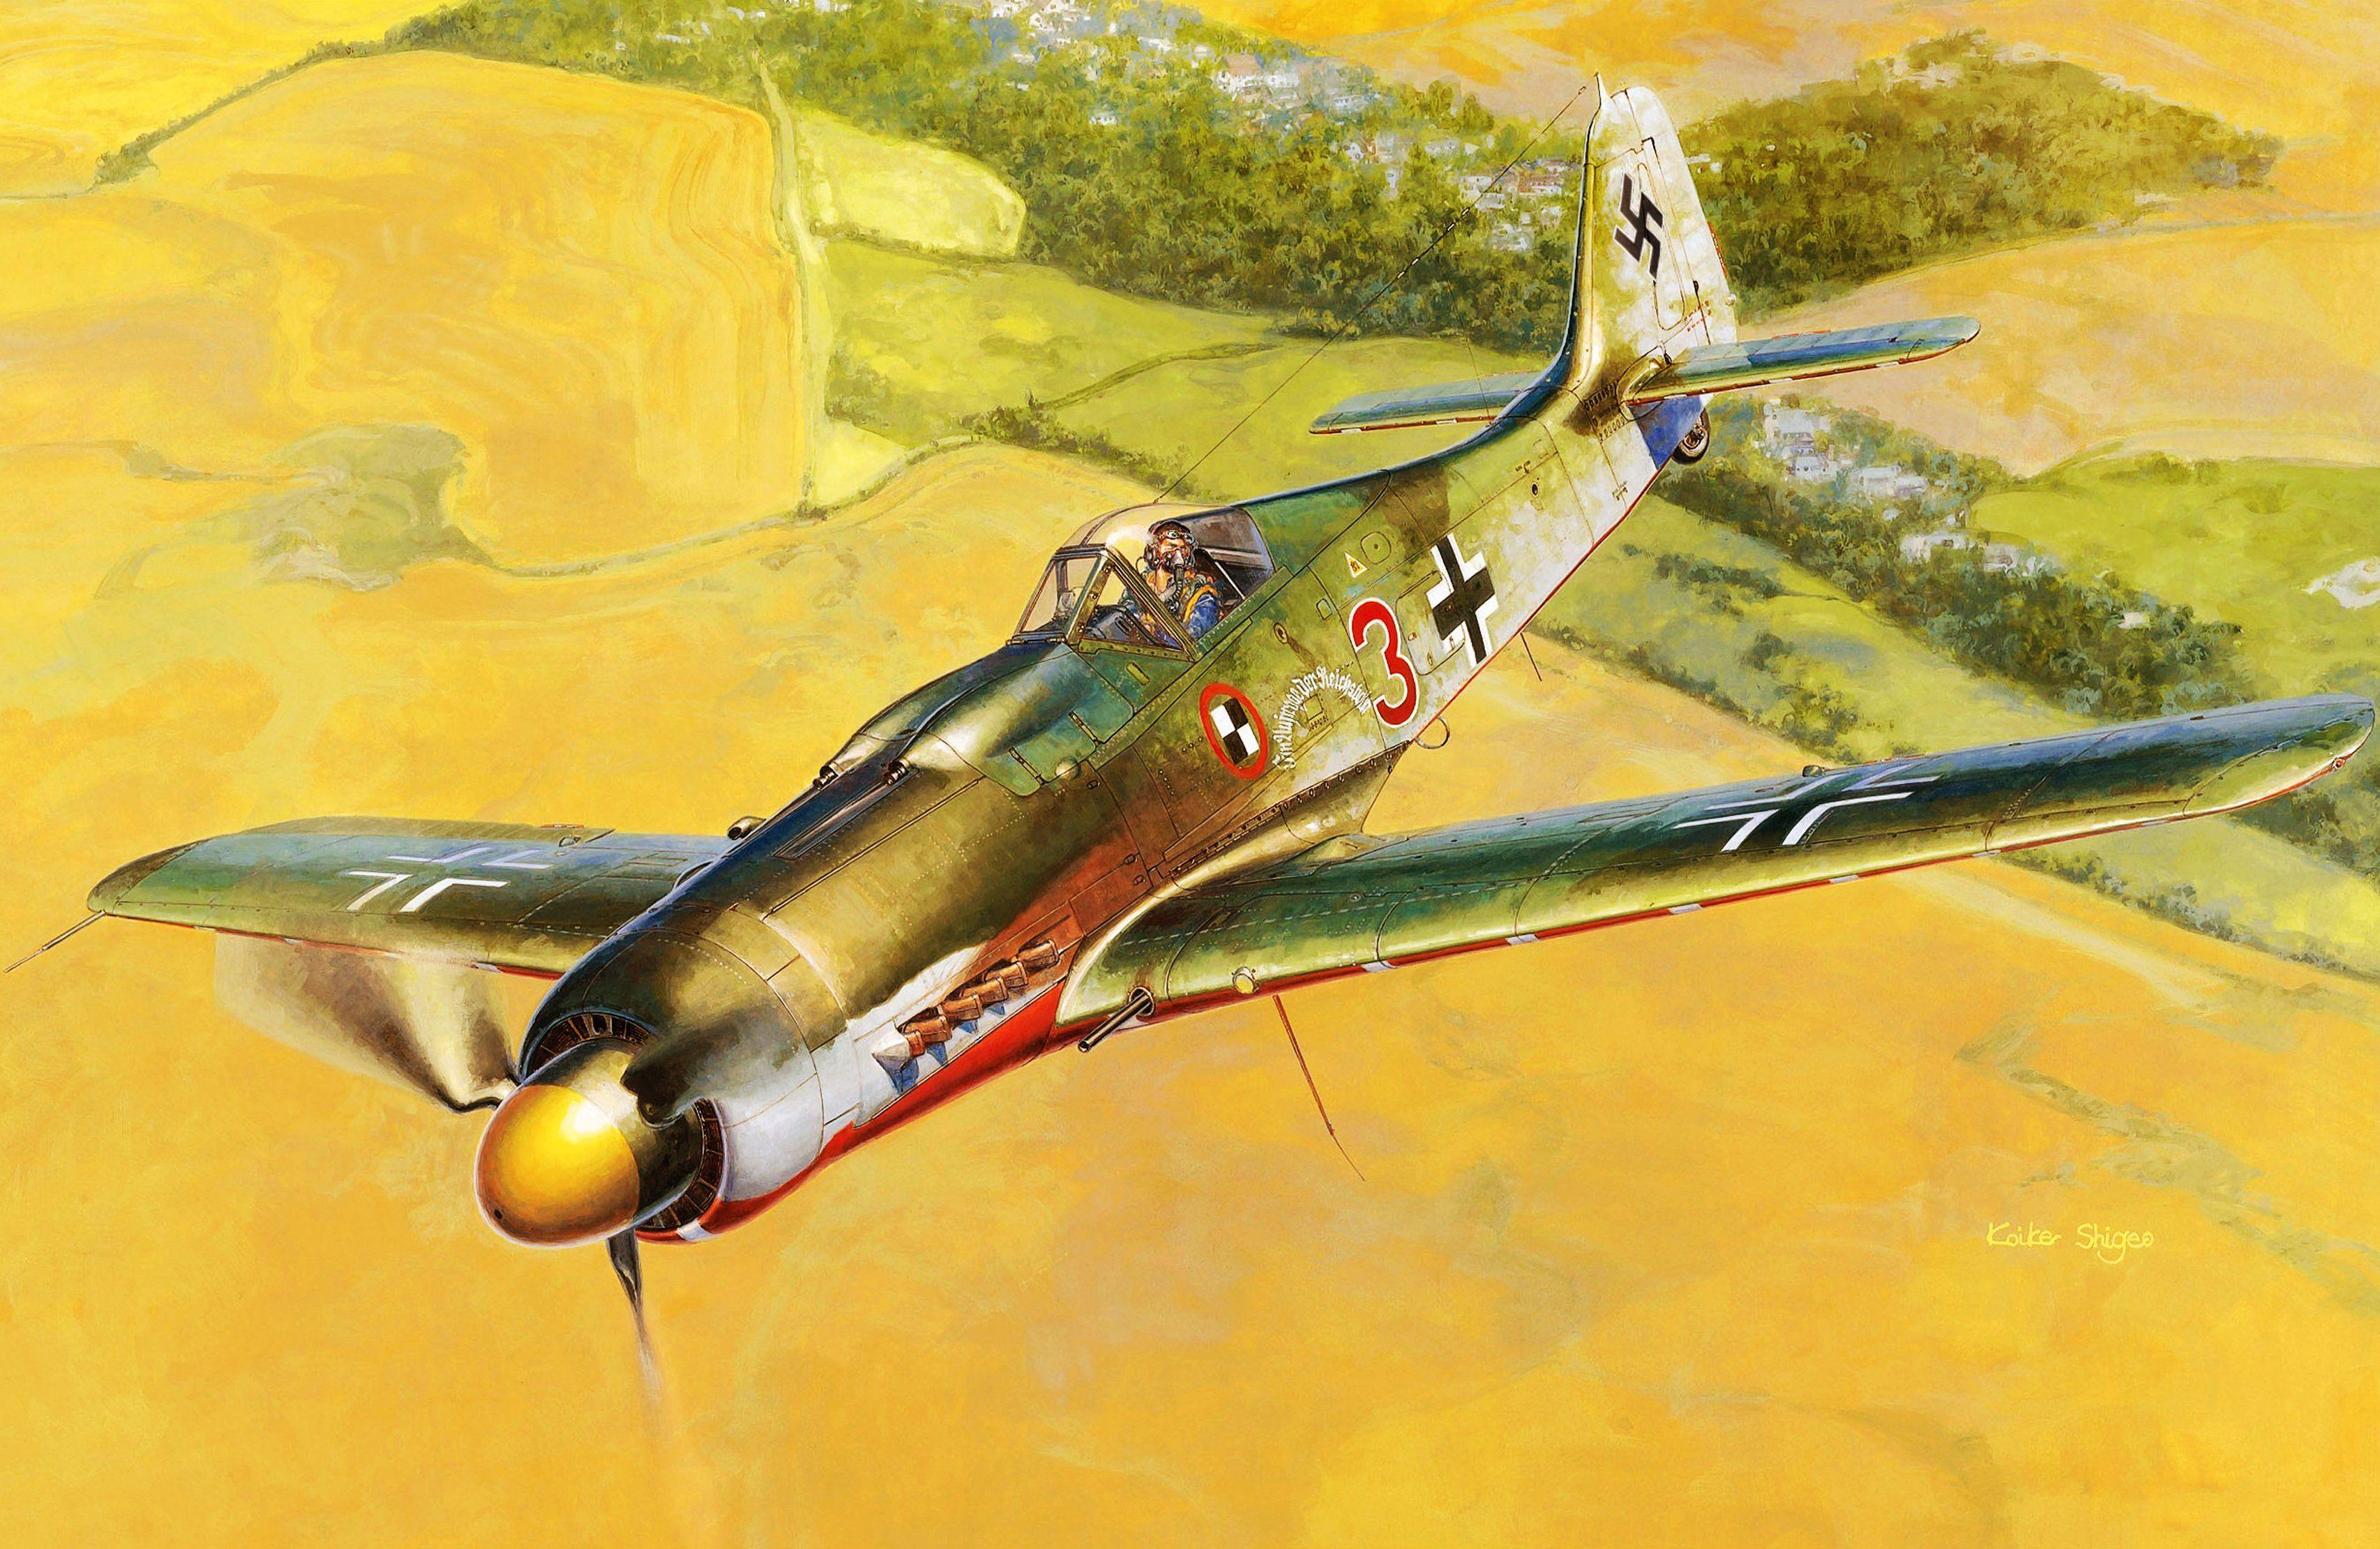 Focke Wulf Fw 190D-9, by Shigeo Koike